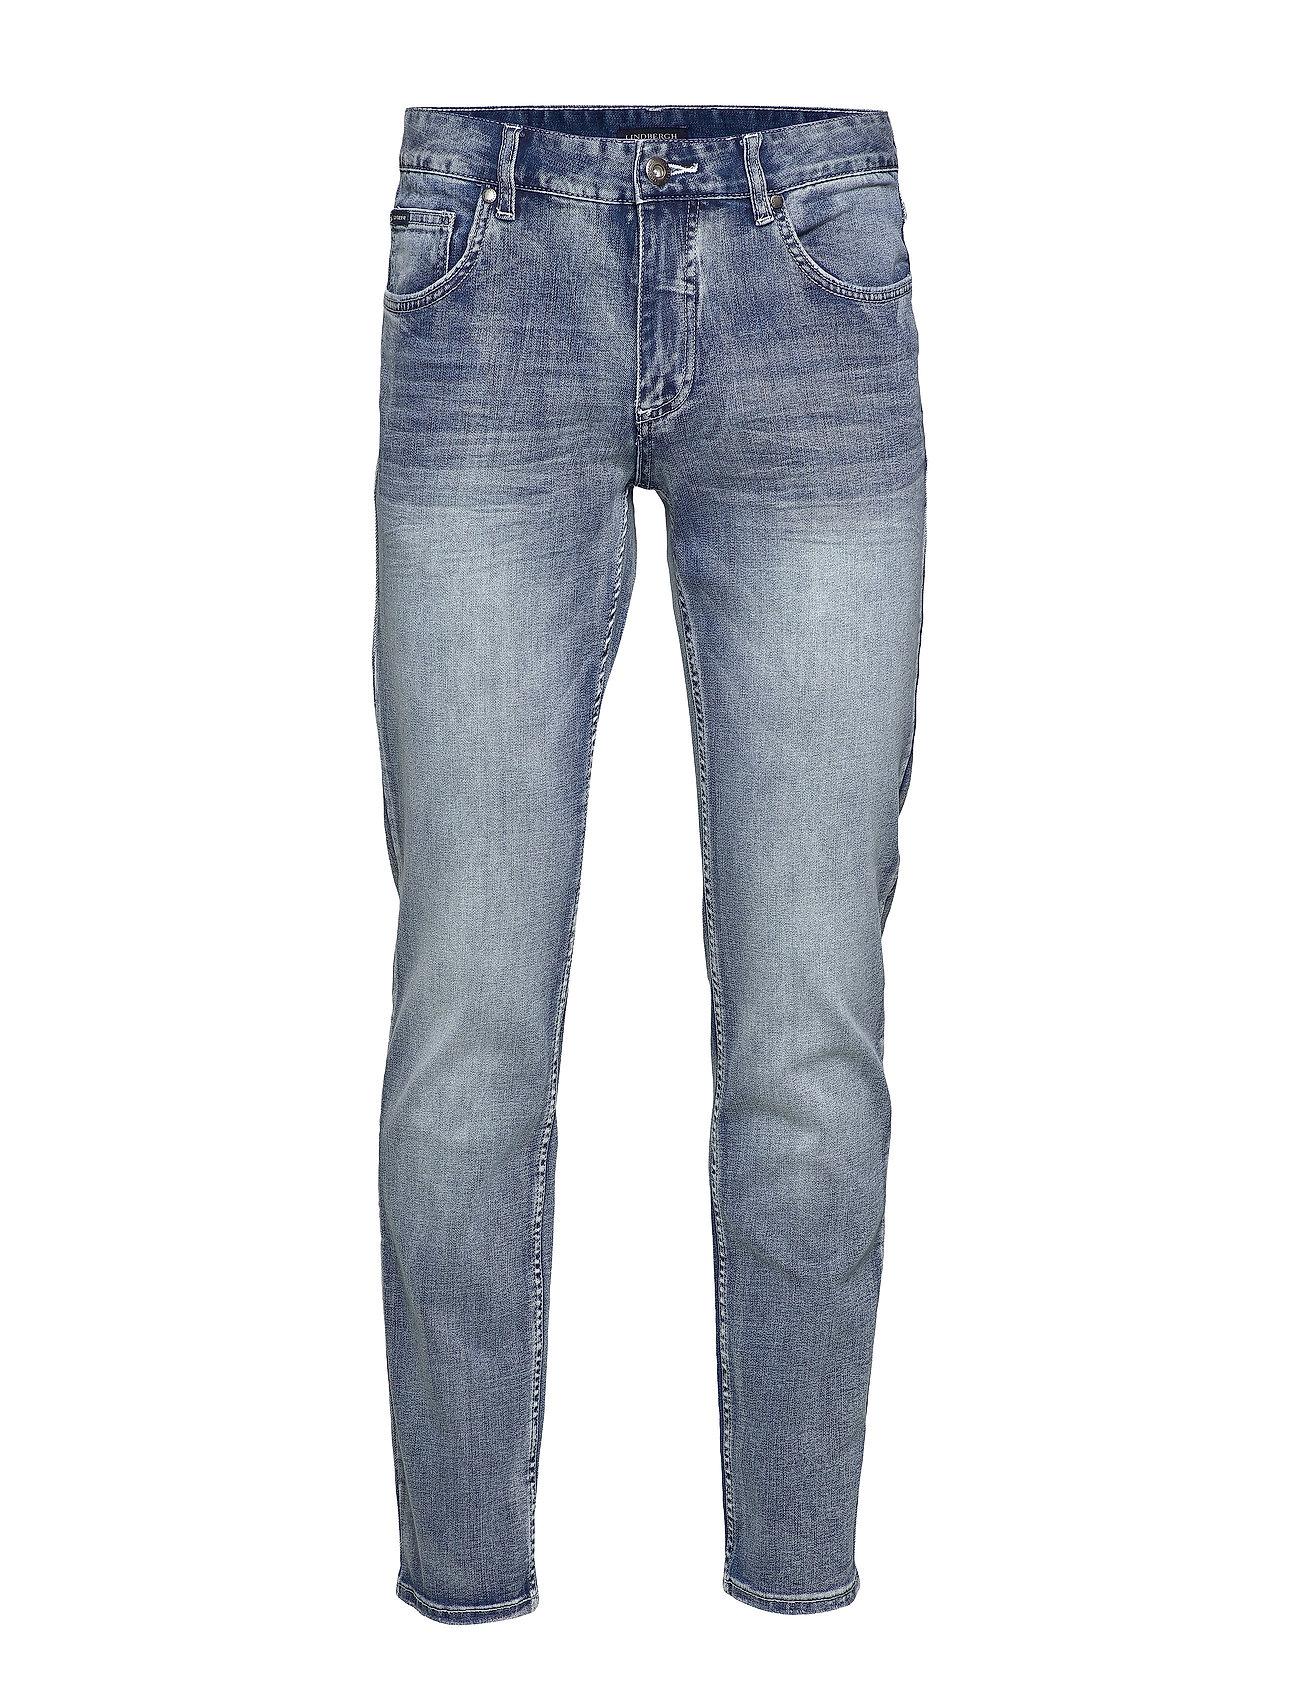 Lindbergh 5 pocket jeans stretch - ARC BLUE